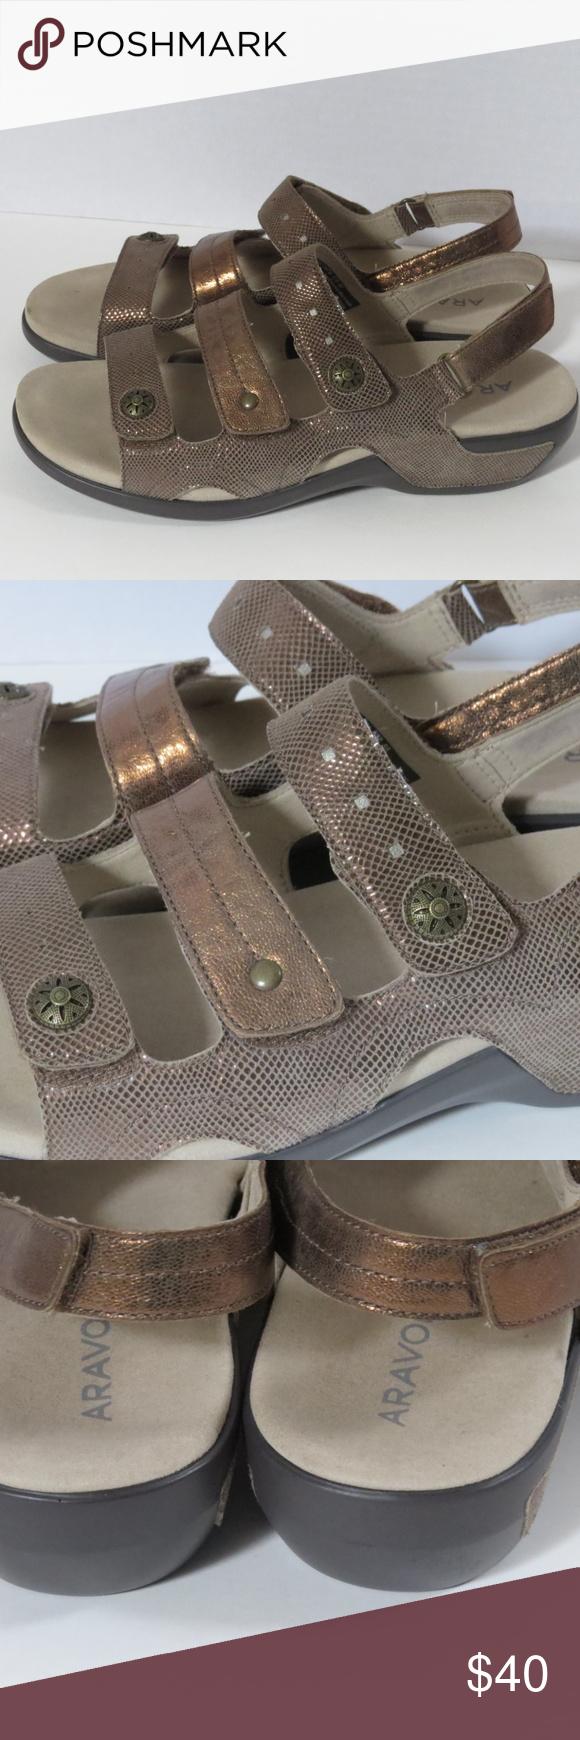 ee34038fa Rockport Aravon Metallic 3 Strap Comfort Sandal 10 Rockport Aravon metallic power  comfort 3 strap sandals